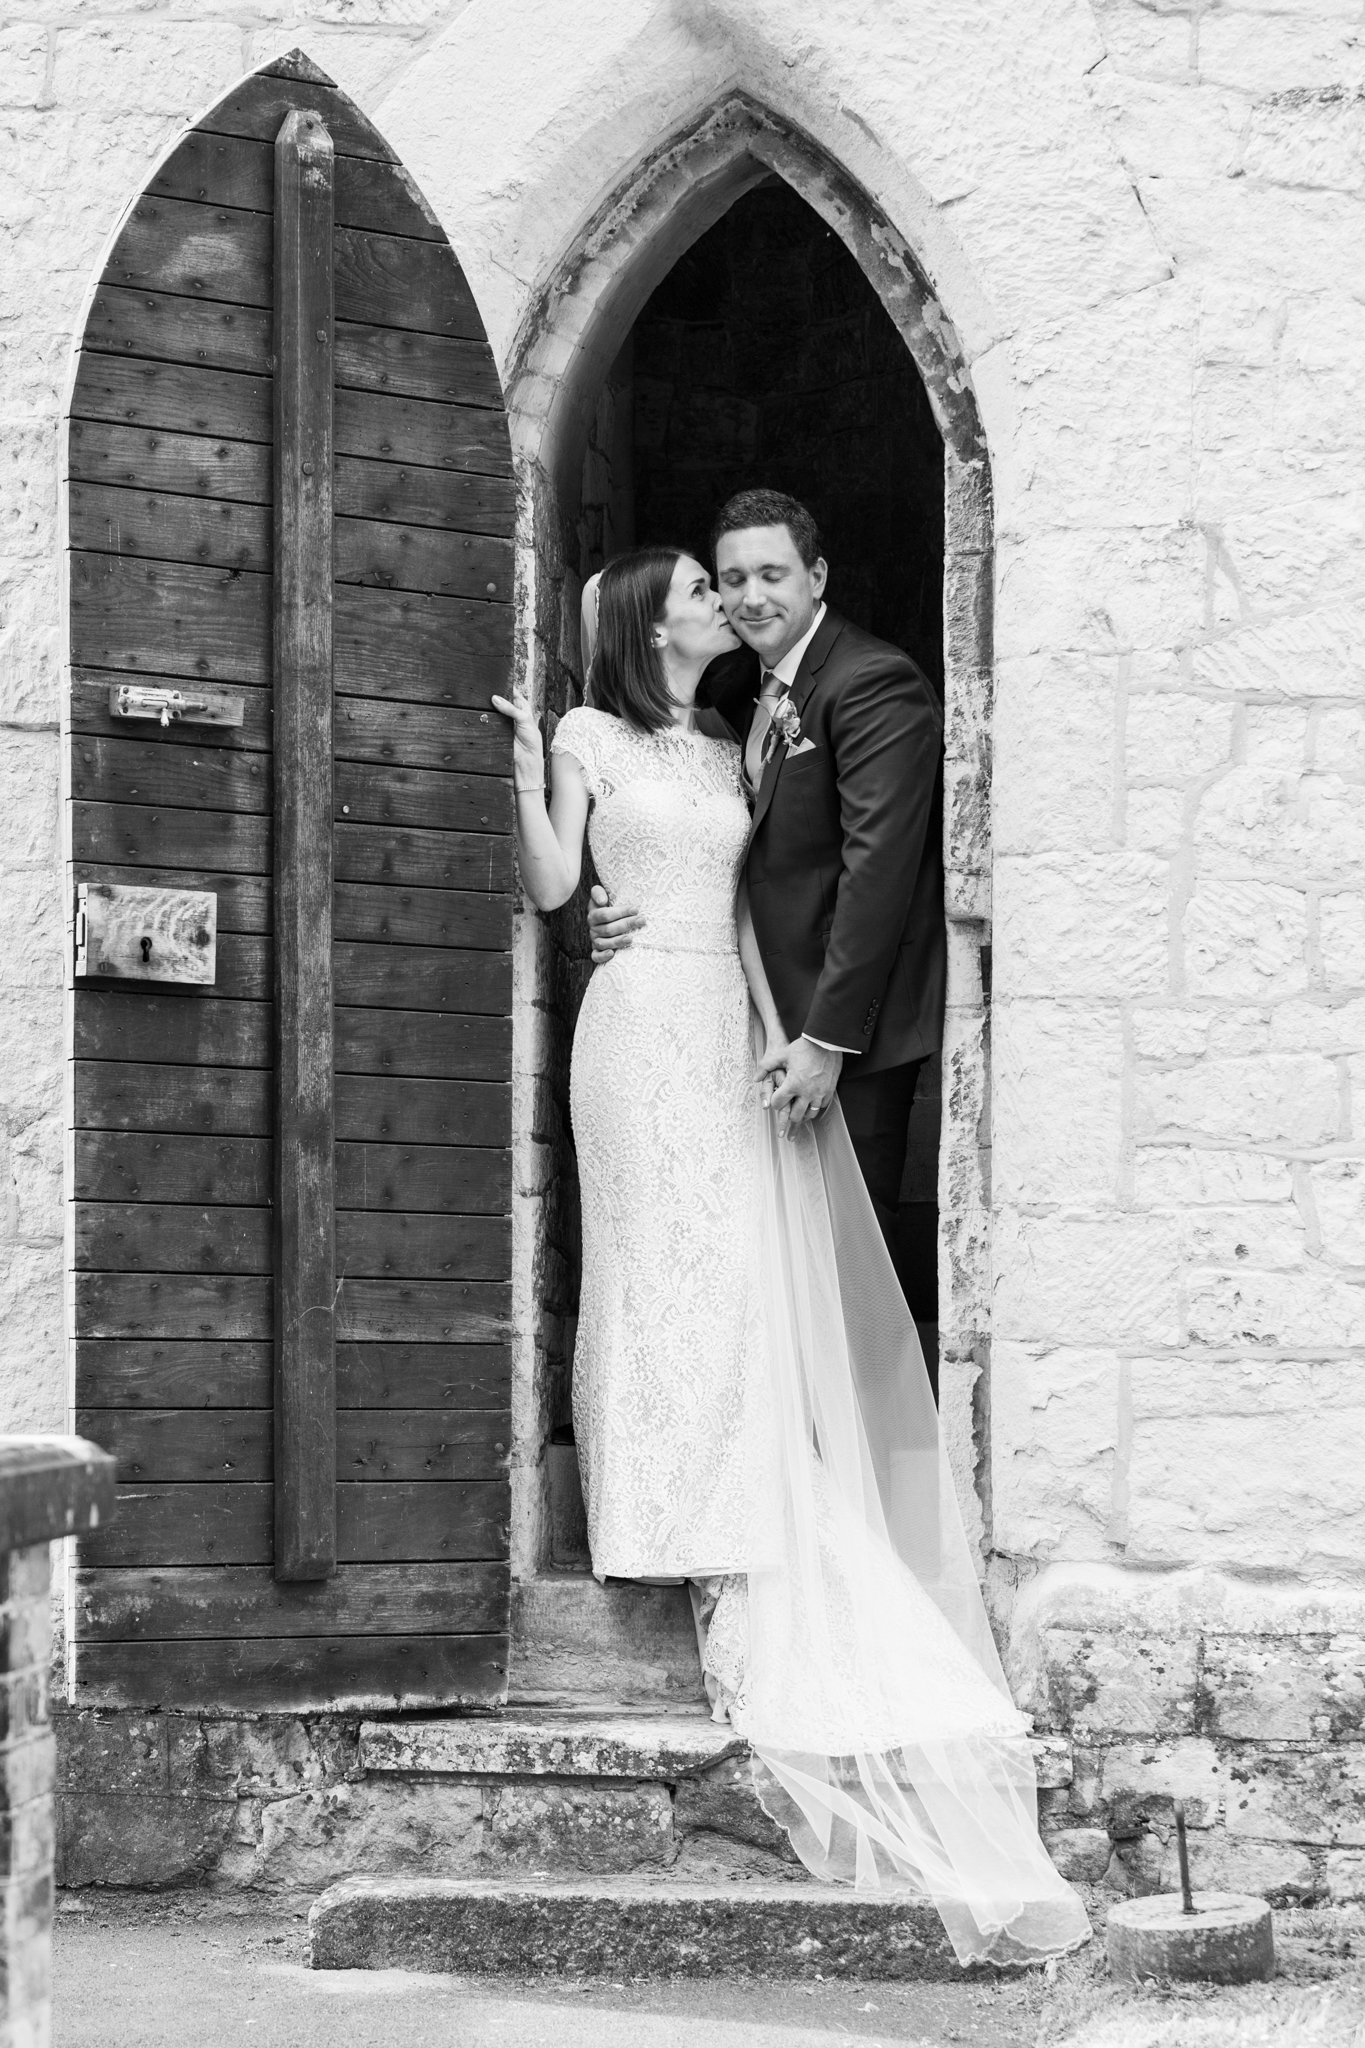 St_Michaels_Betchworth_Surrey_Wedding_Photographer_Rachel_Thornhill_Photography